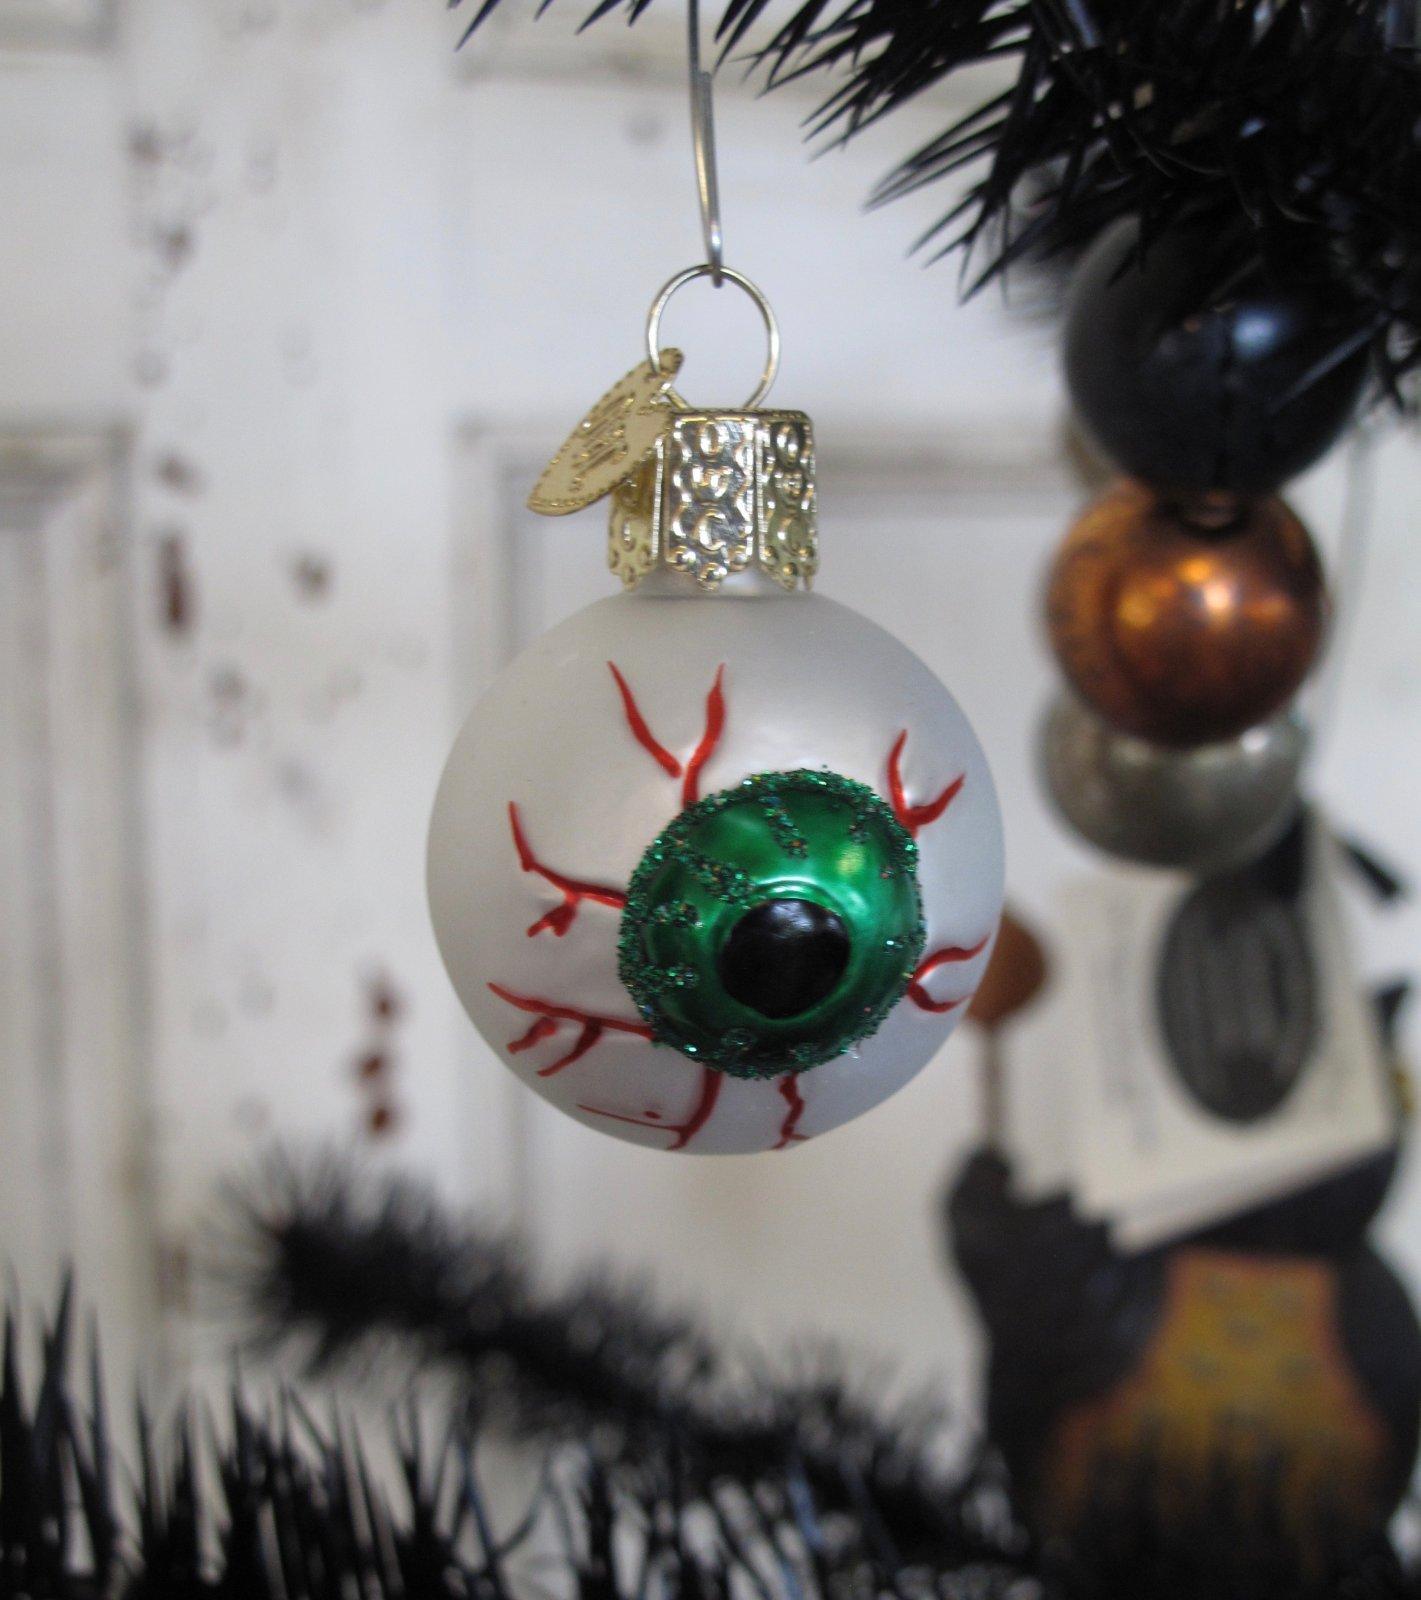 Eyeball christmas ornaments - Evil Eye Ornament Old World Christmas